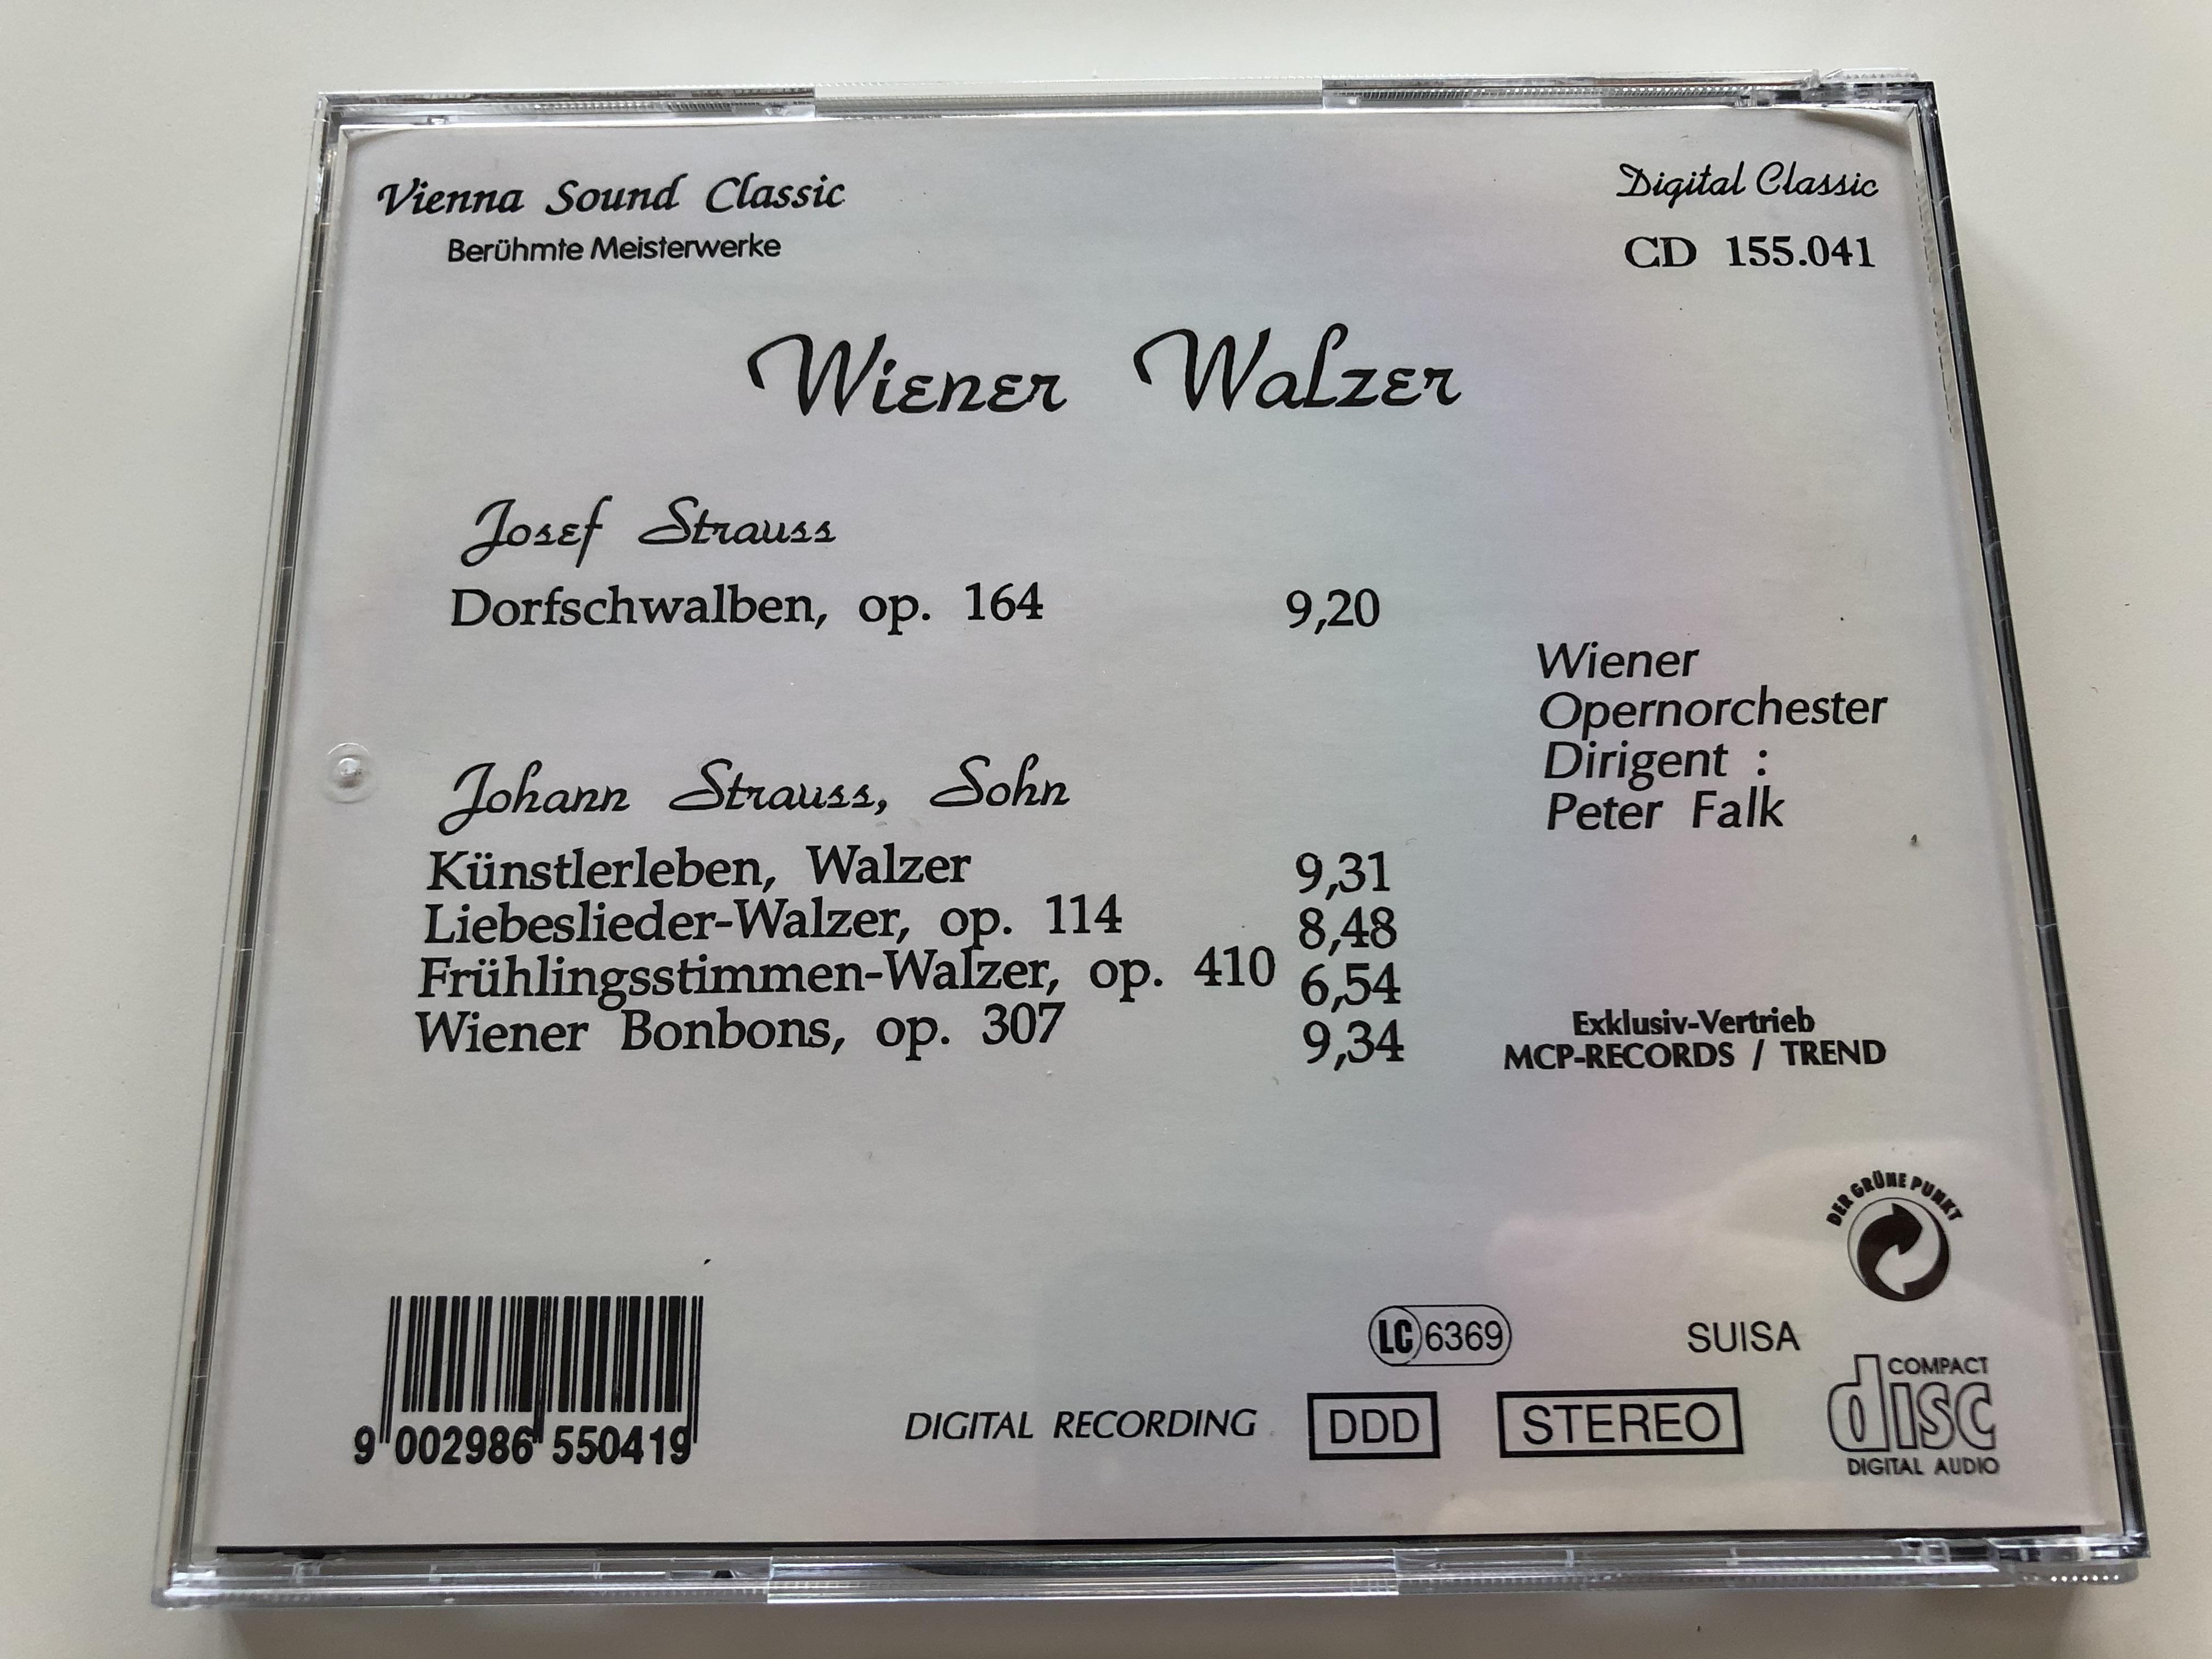 wiener-walzerimg-2527.jpg